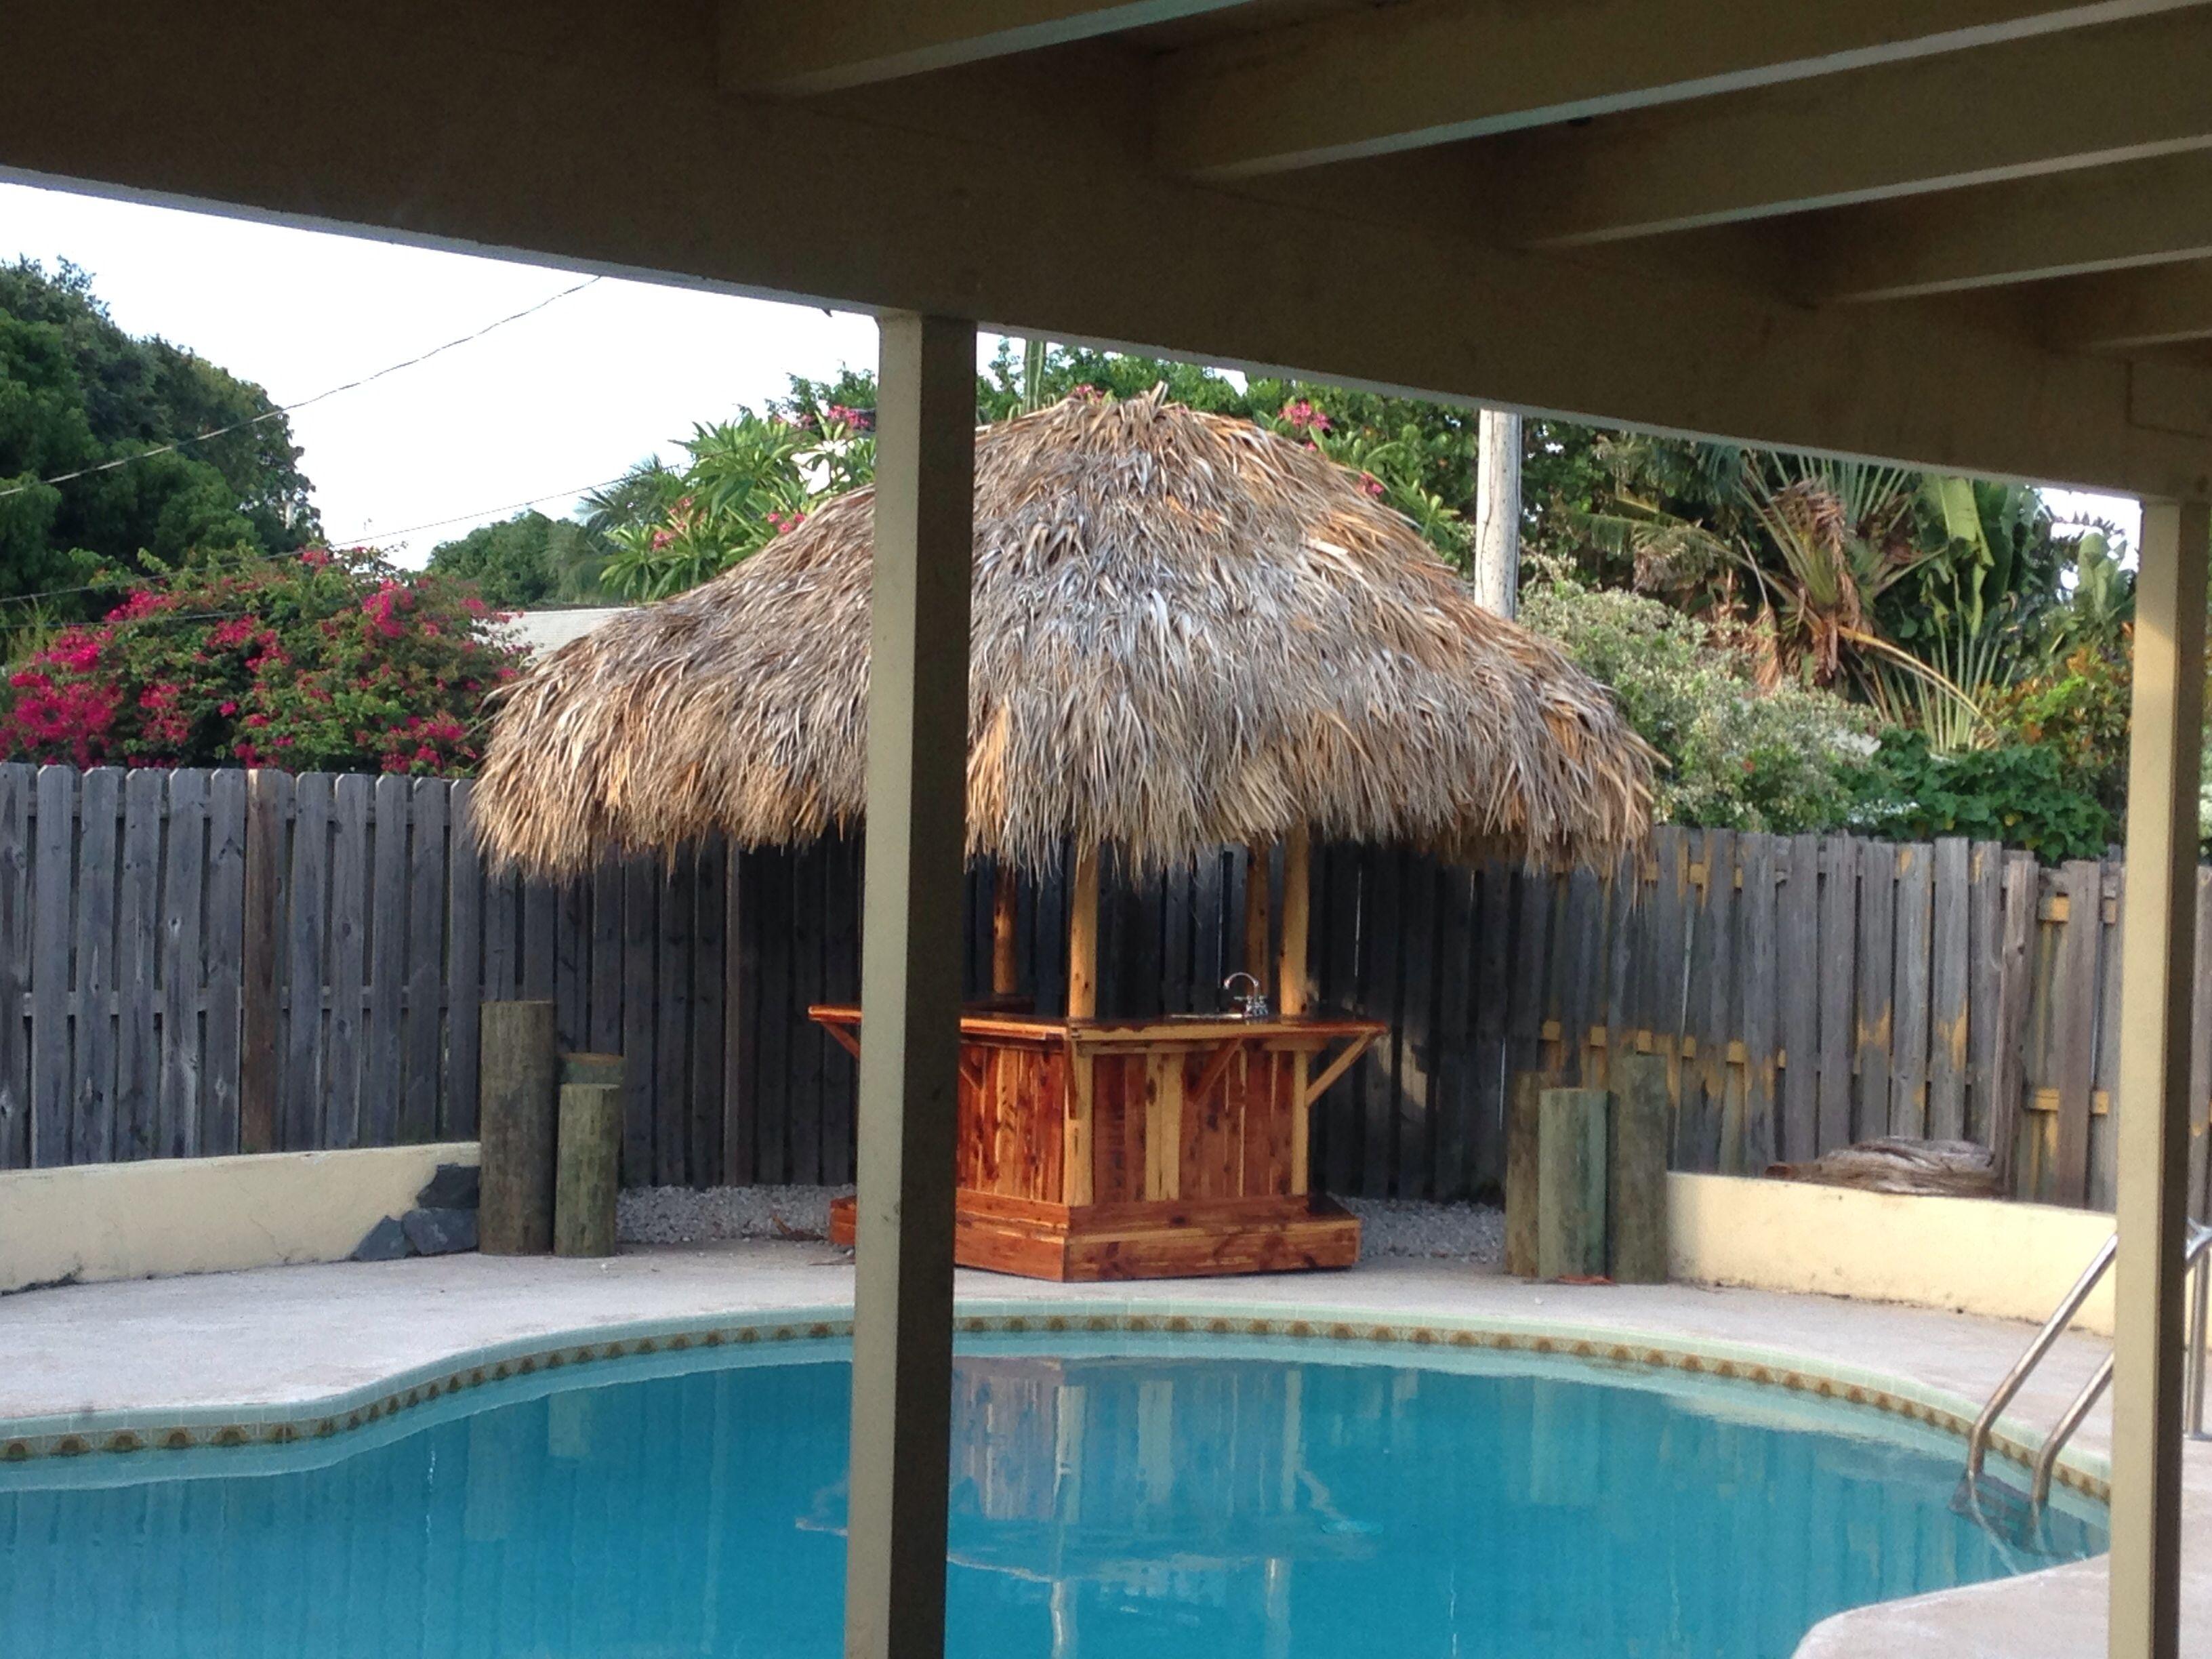 Backyard tiki bar | New House Ideas | Pinterest on Tiki Bar Designs For Backyard id=32360